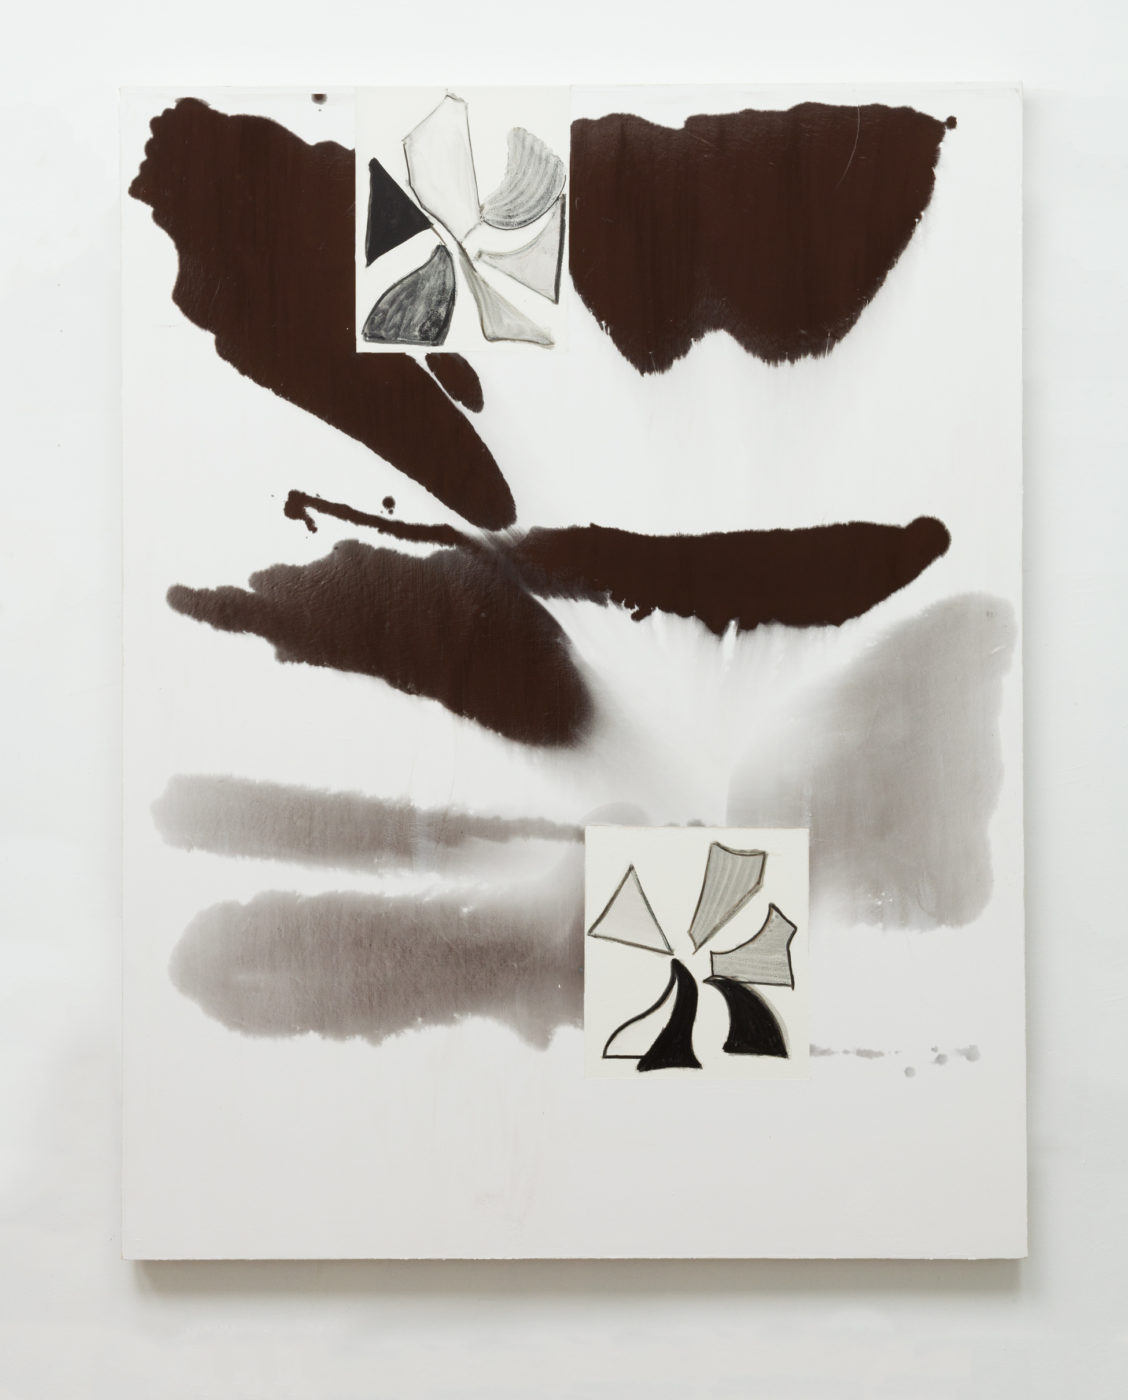 T293 - Henry Chapman - 10